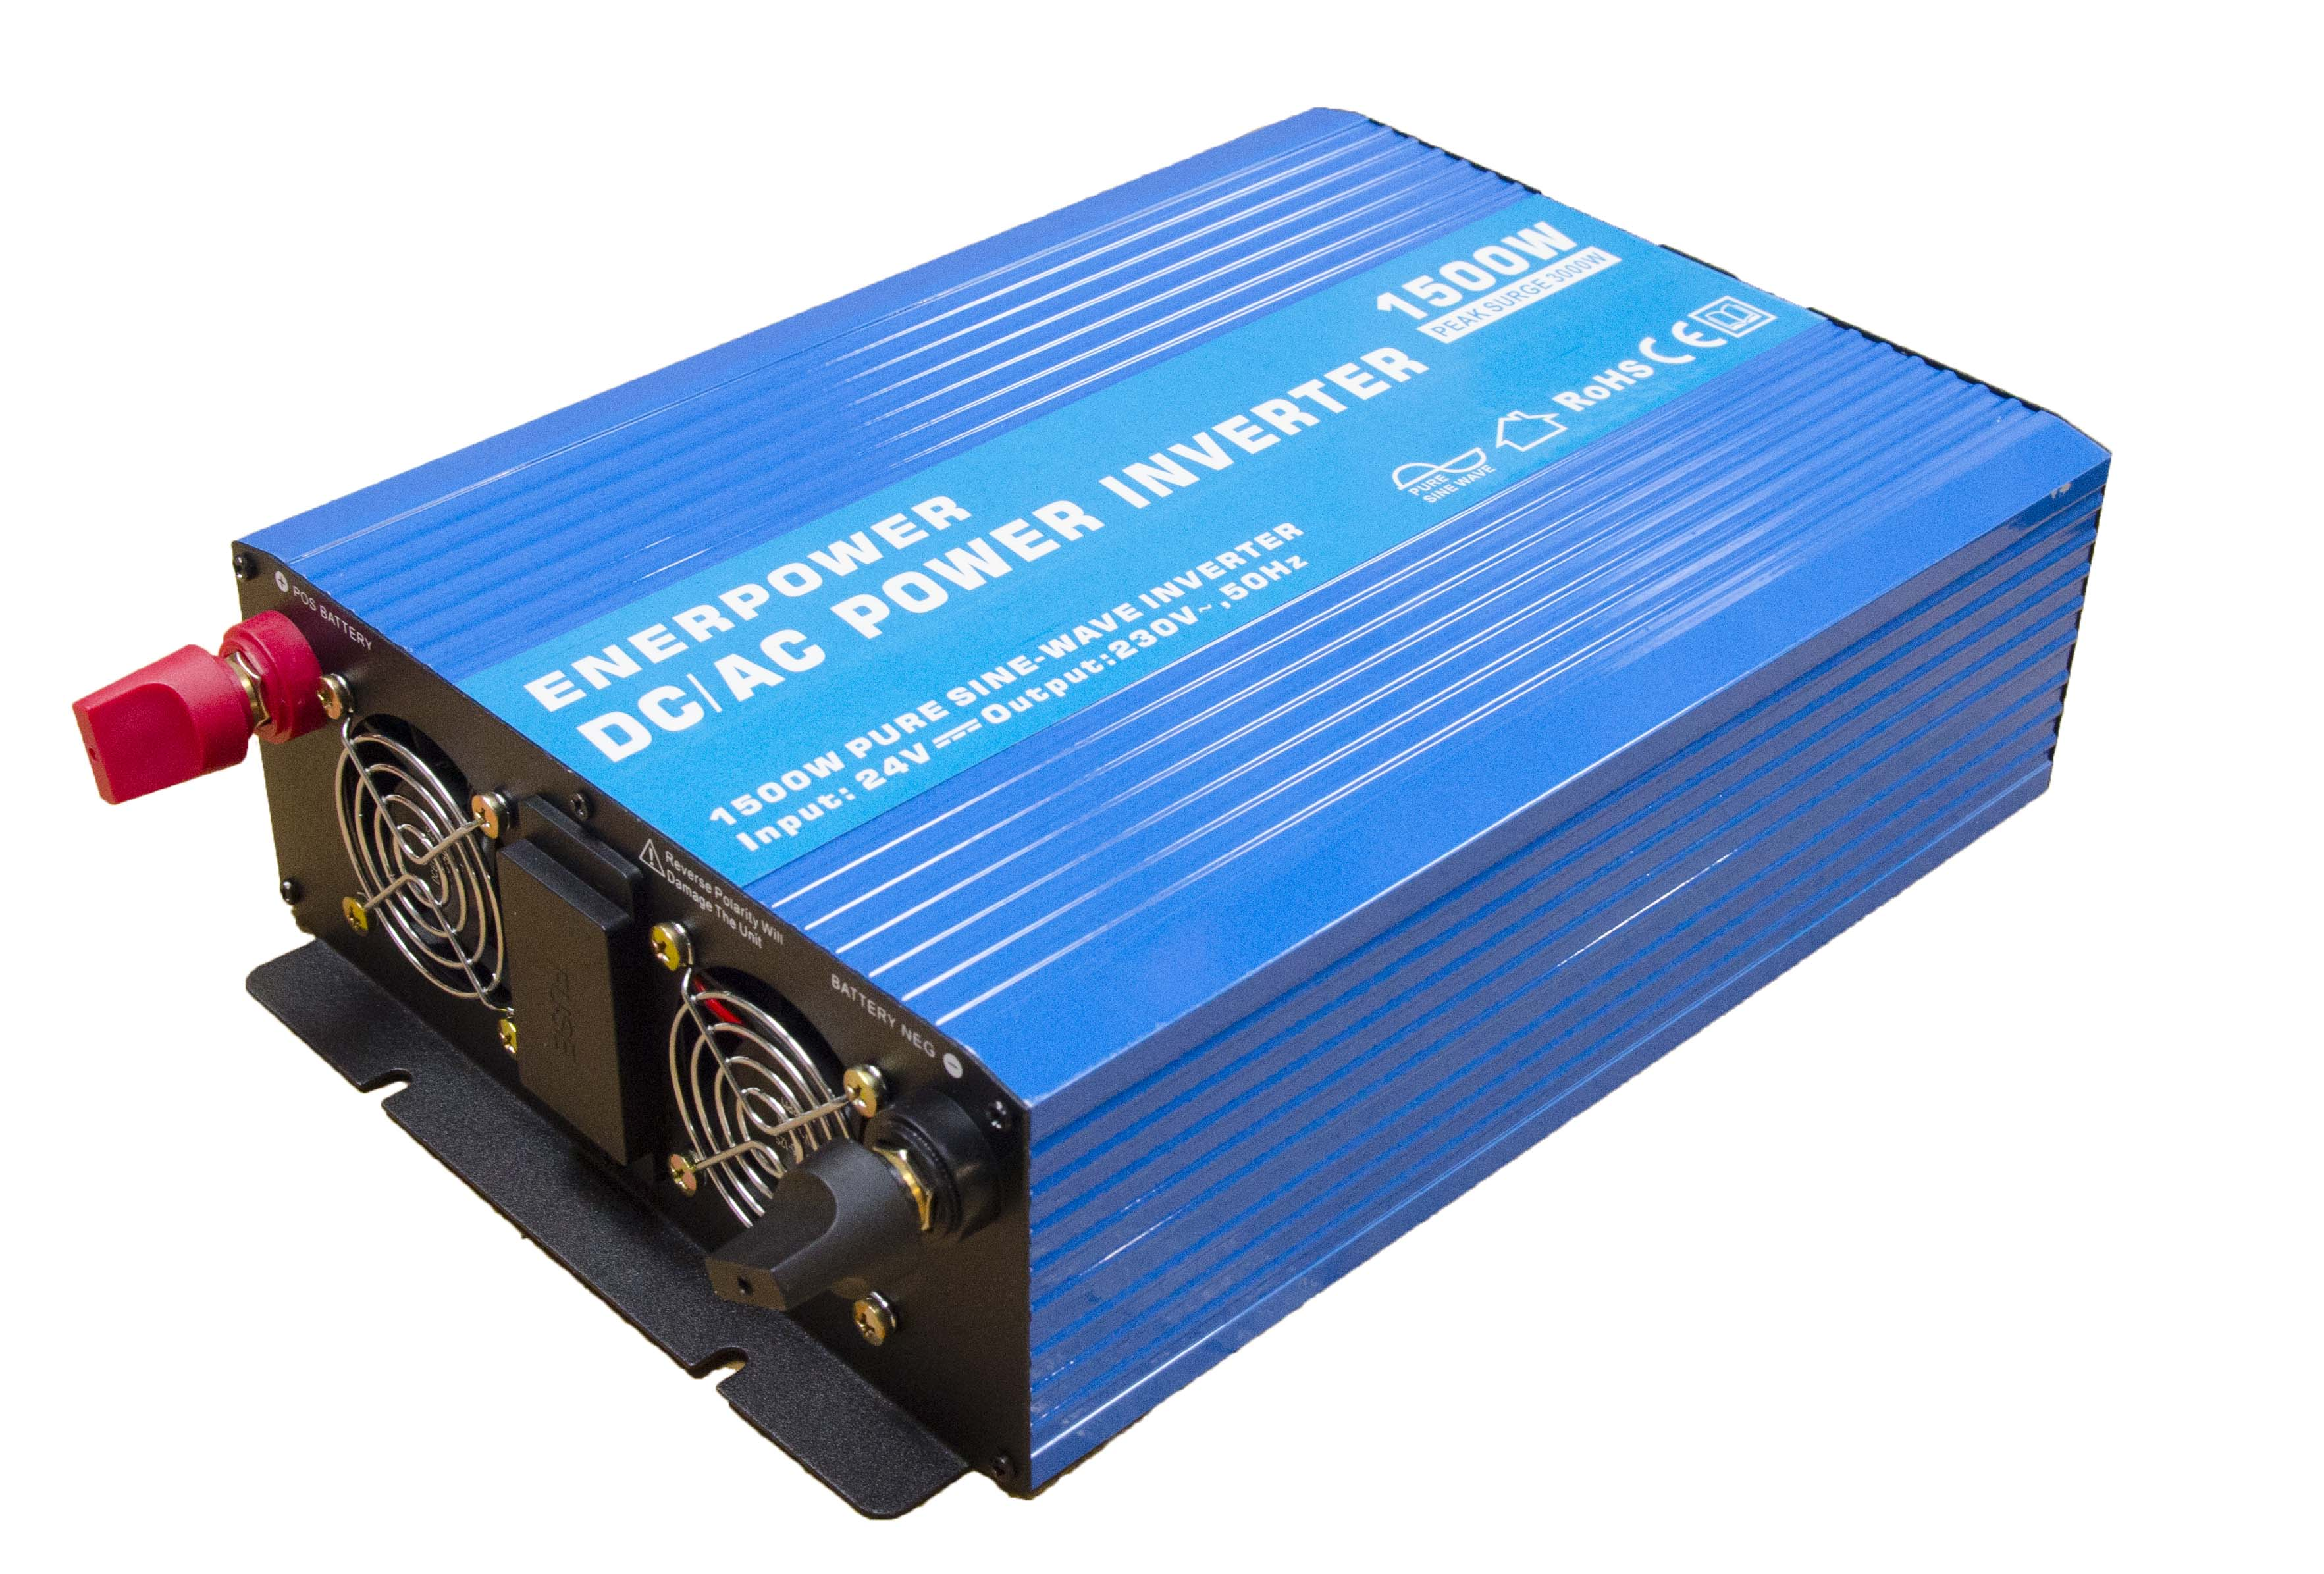 inverter 24V 1500W Enerpower